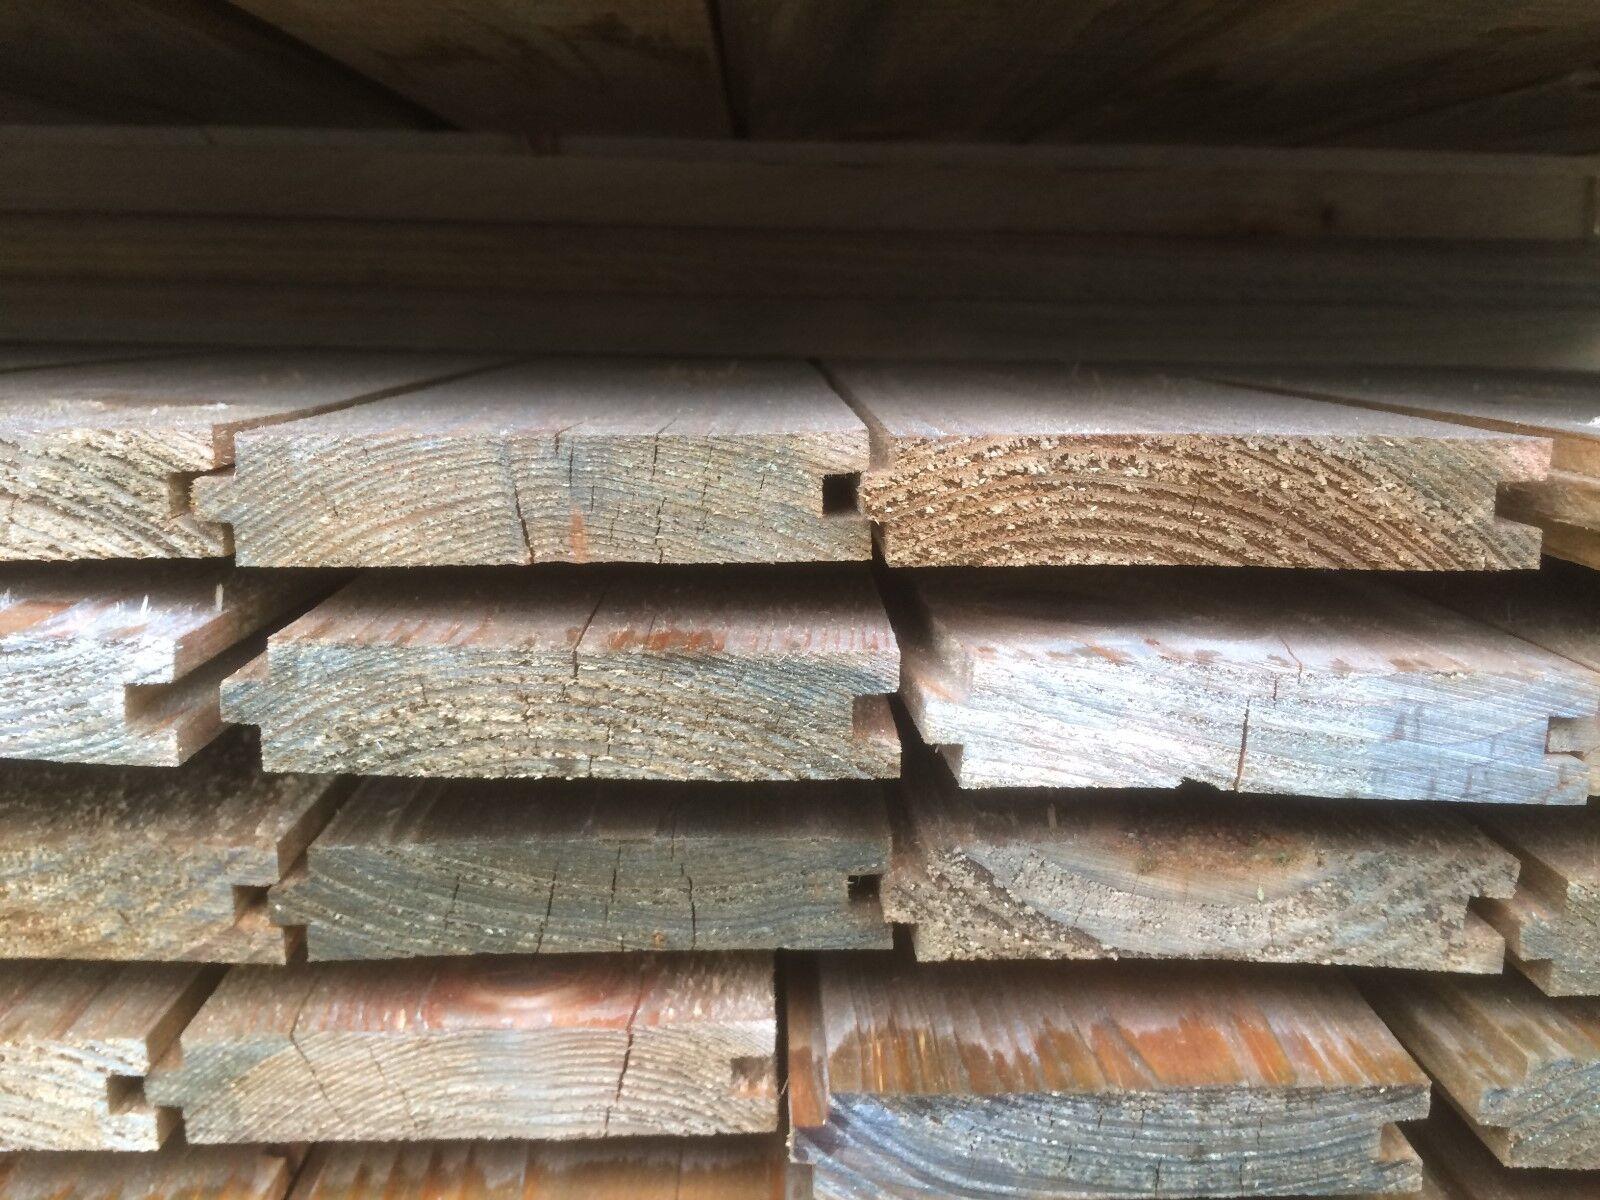 42 m² imprägnierte rauhspund bretter profilholz profilbretter